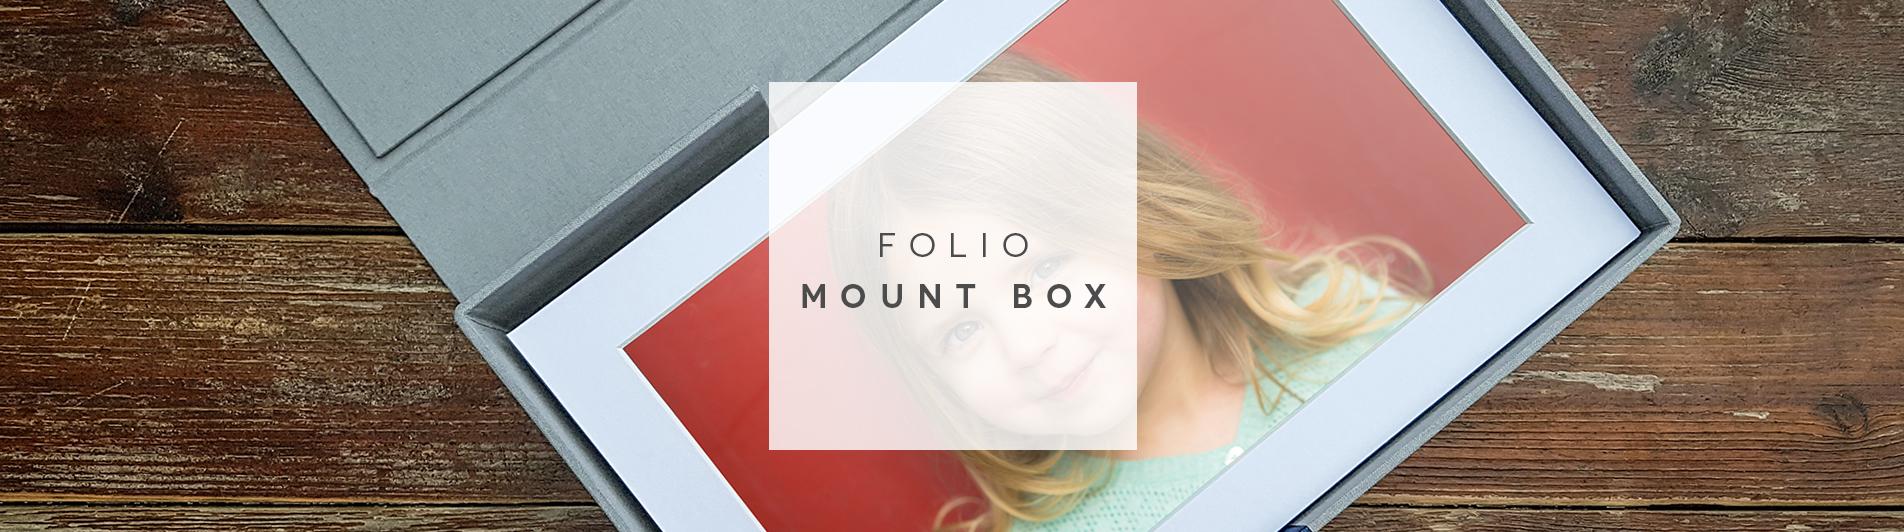 Header image for Folio Mount Boxes